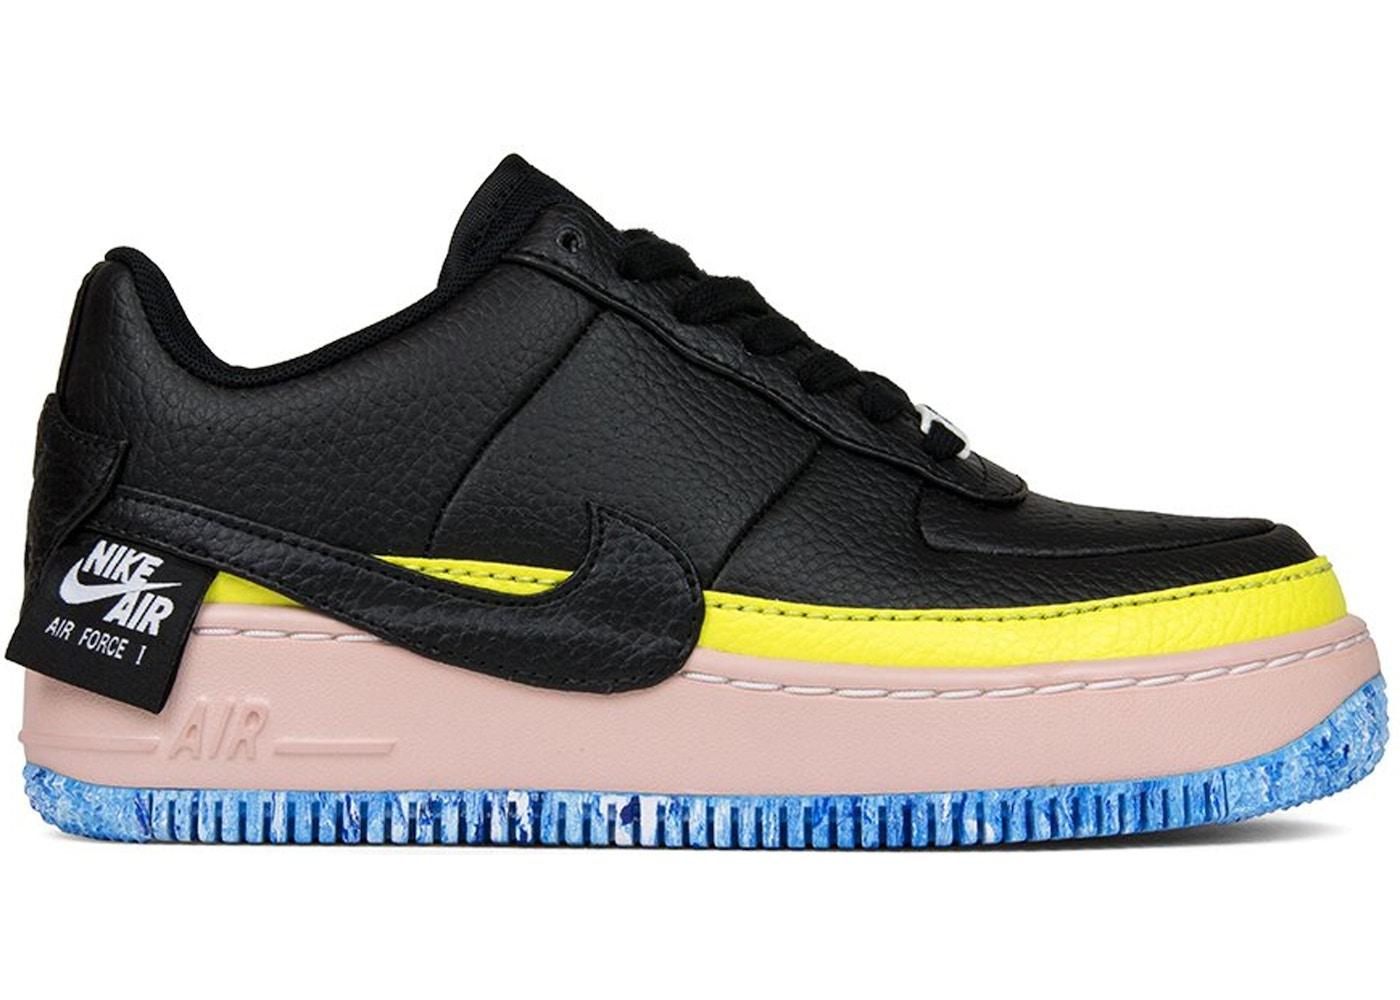 Nike Air Lowest Asks Force Shoes New 4Lq53ARj